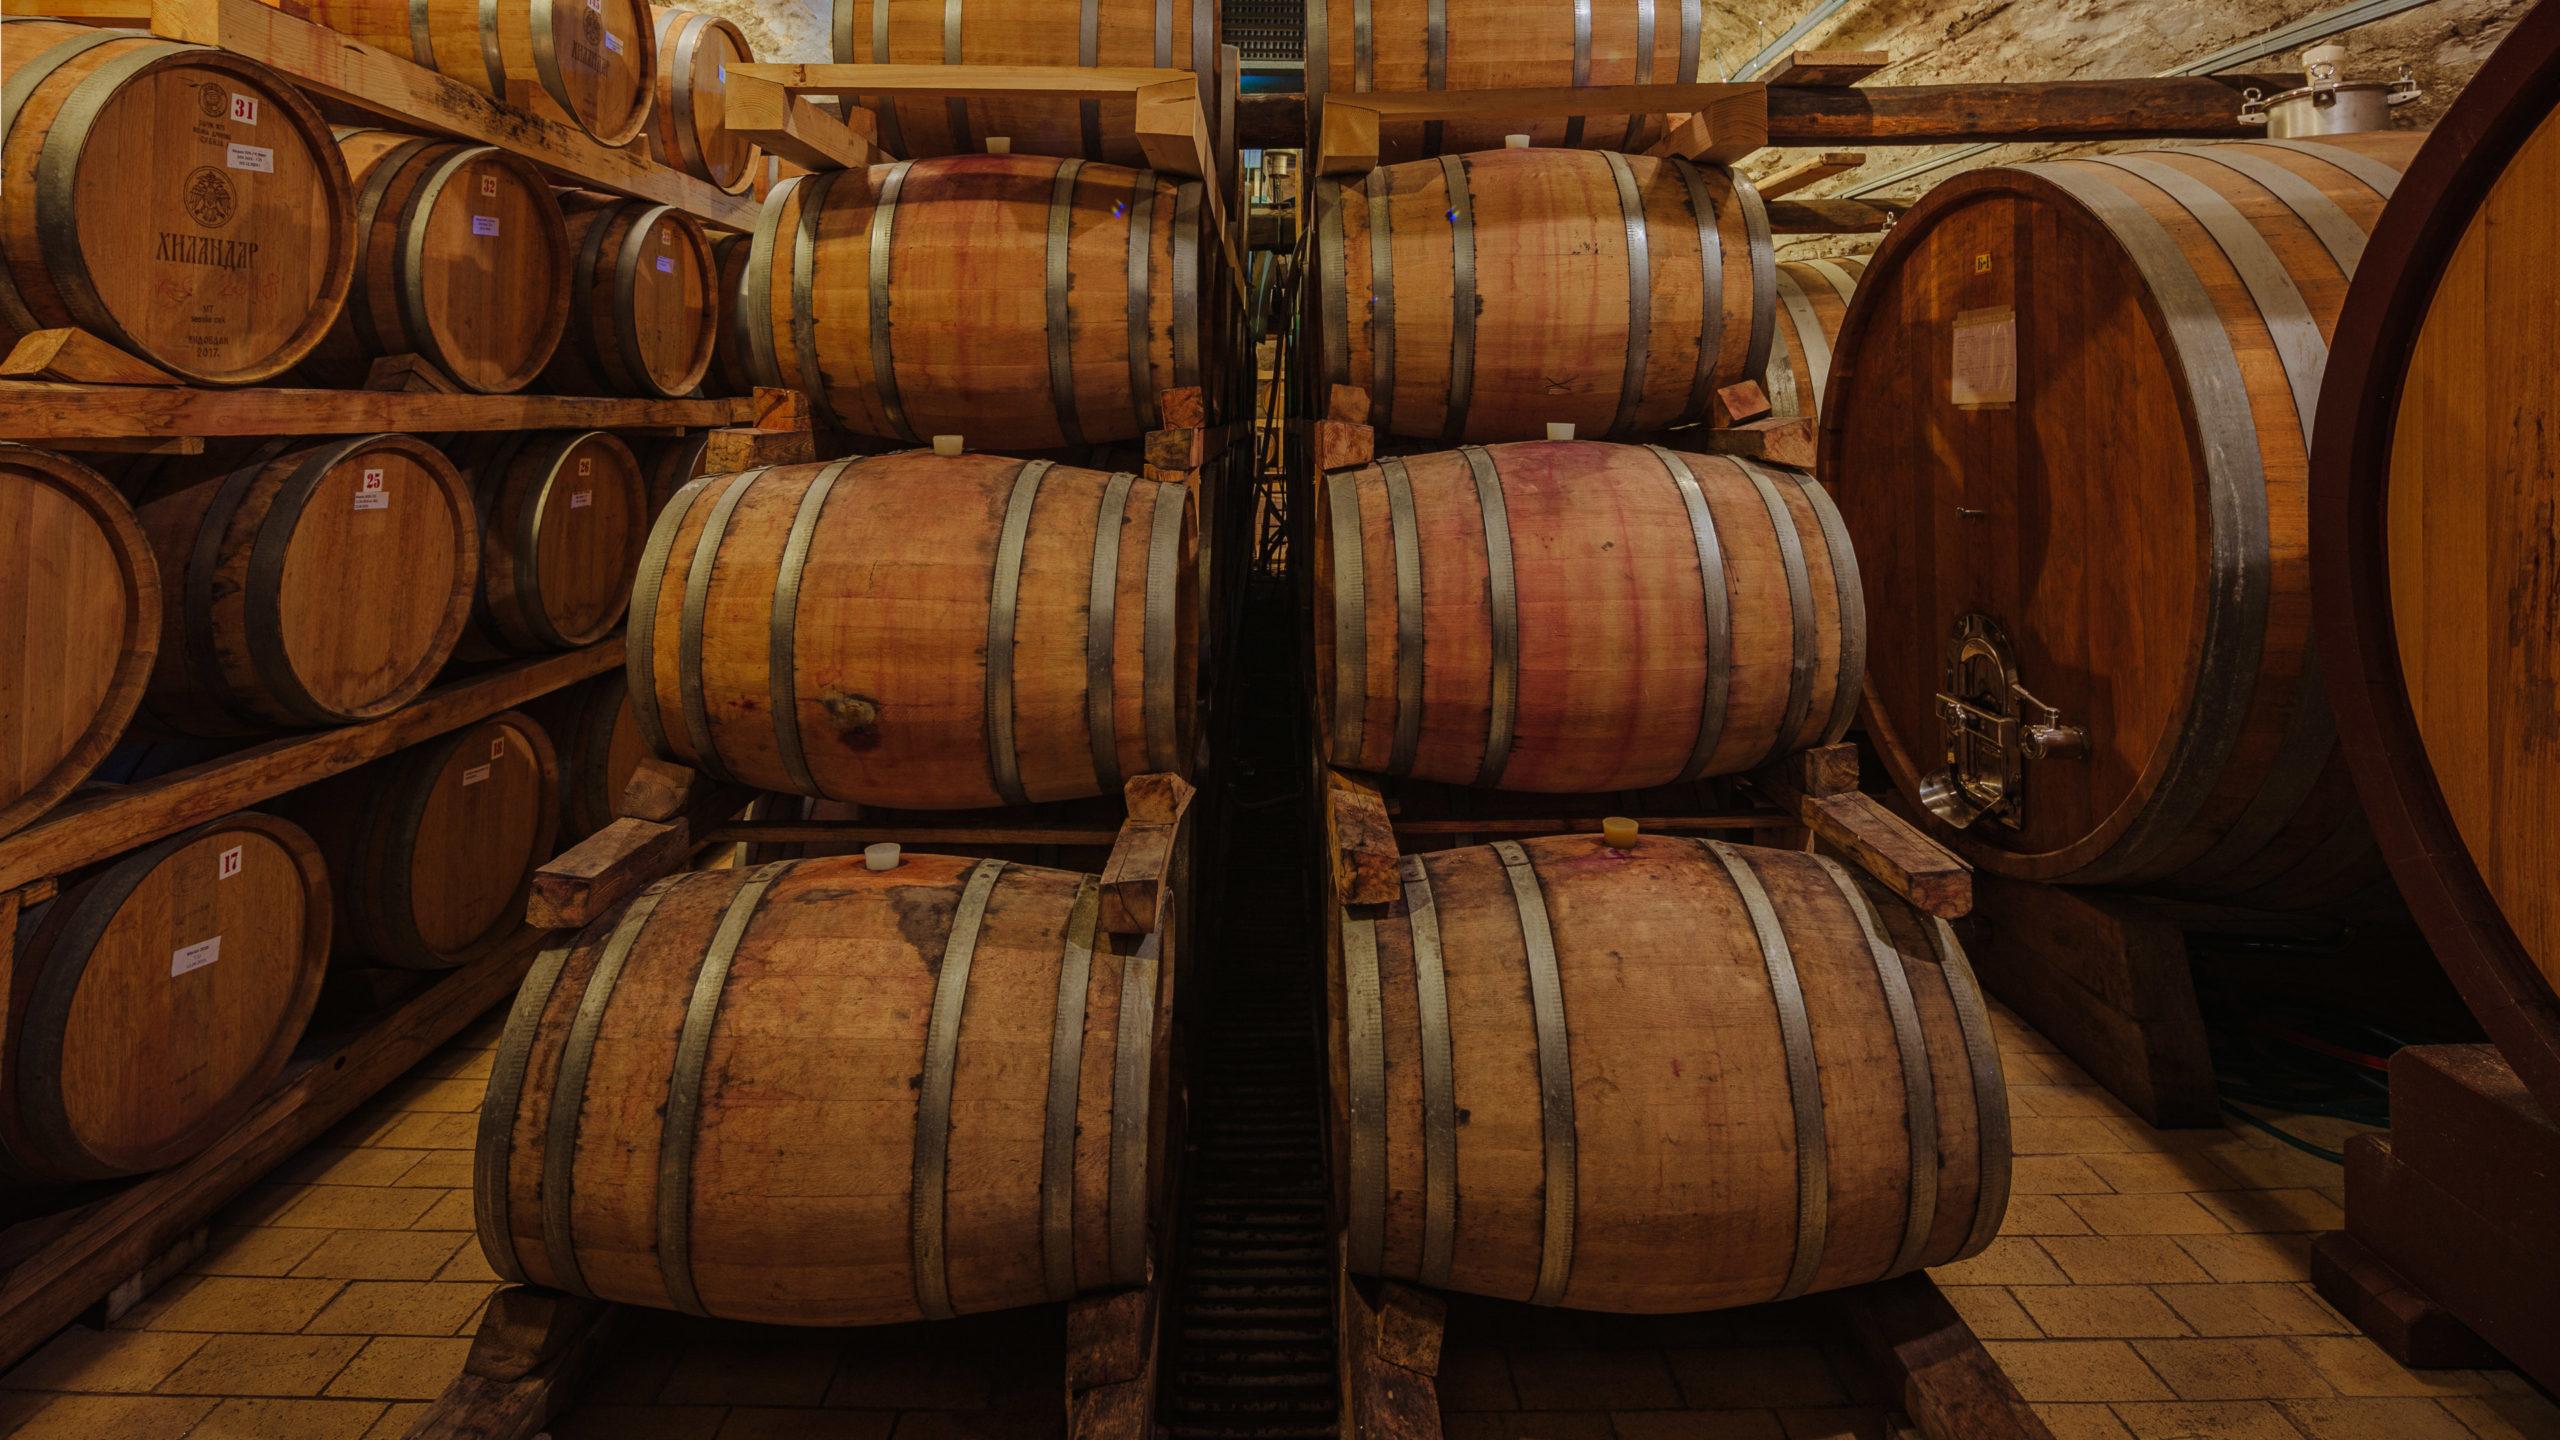 The Winery - Hilandar Shop